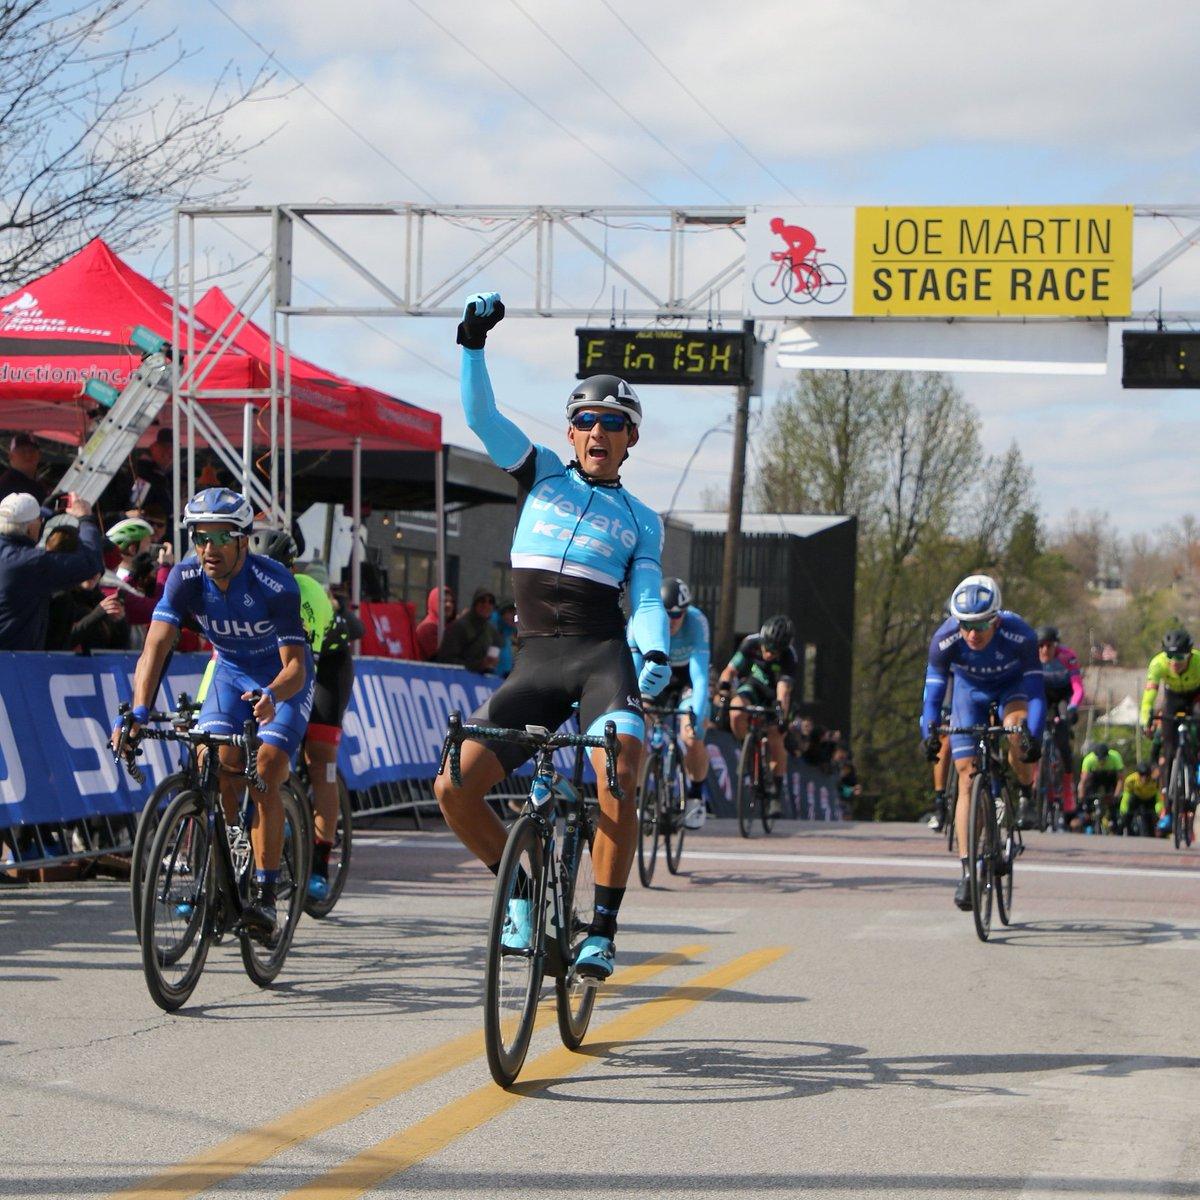 Image result for jose alfredo rodriguez cyclist joe martin